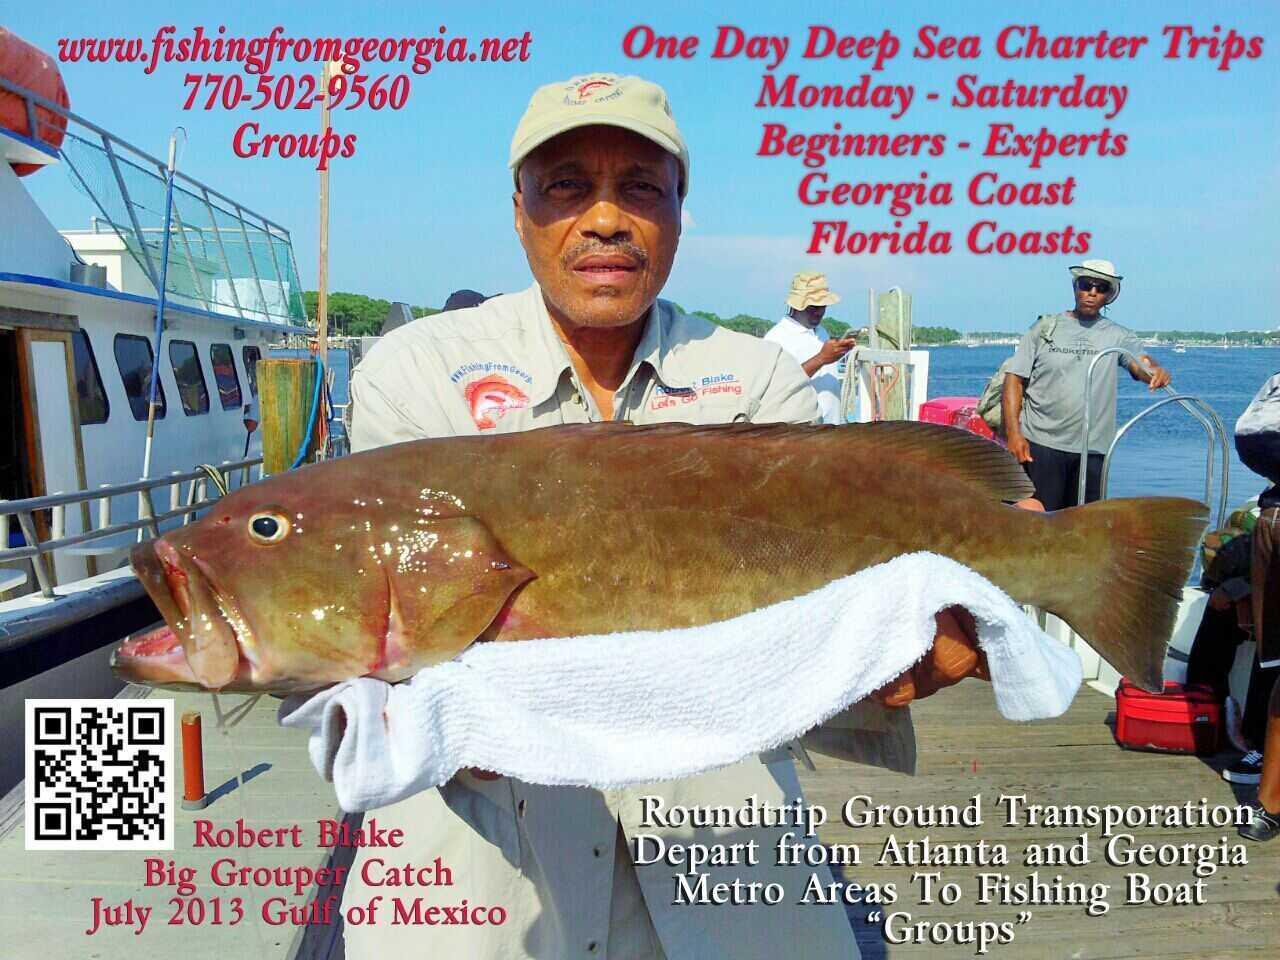 Big grouper catch by robert fishing blake coastal angler for Big fishing net